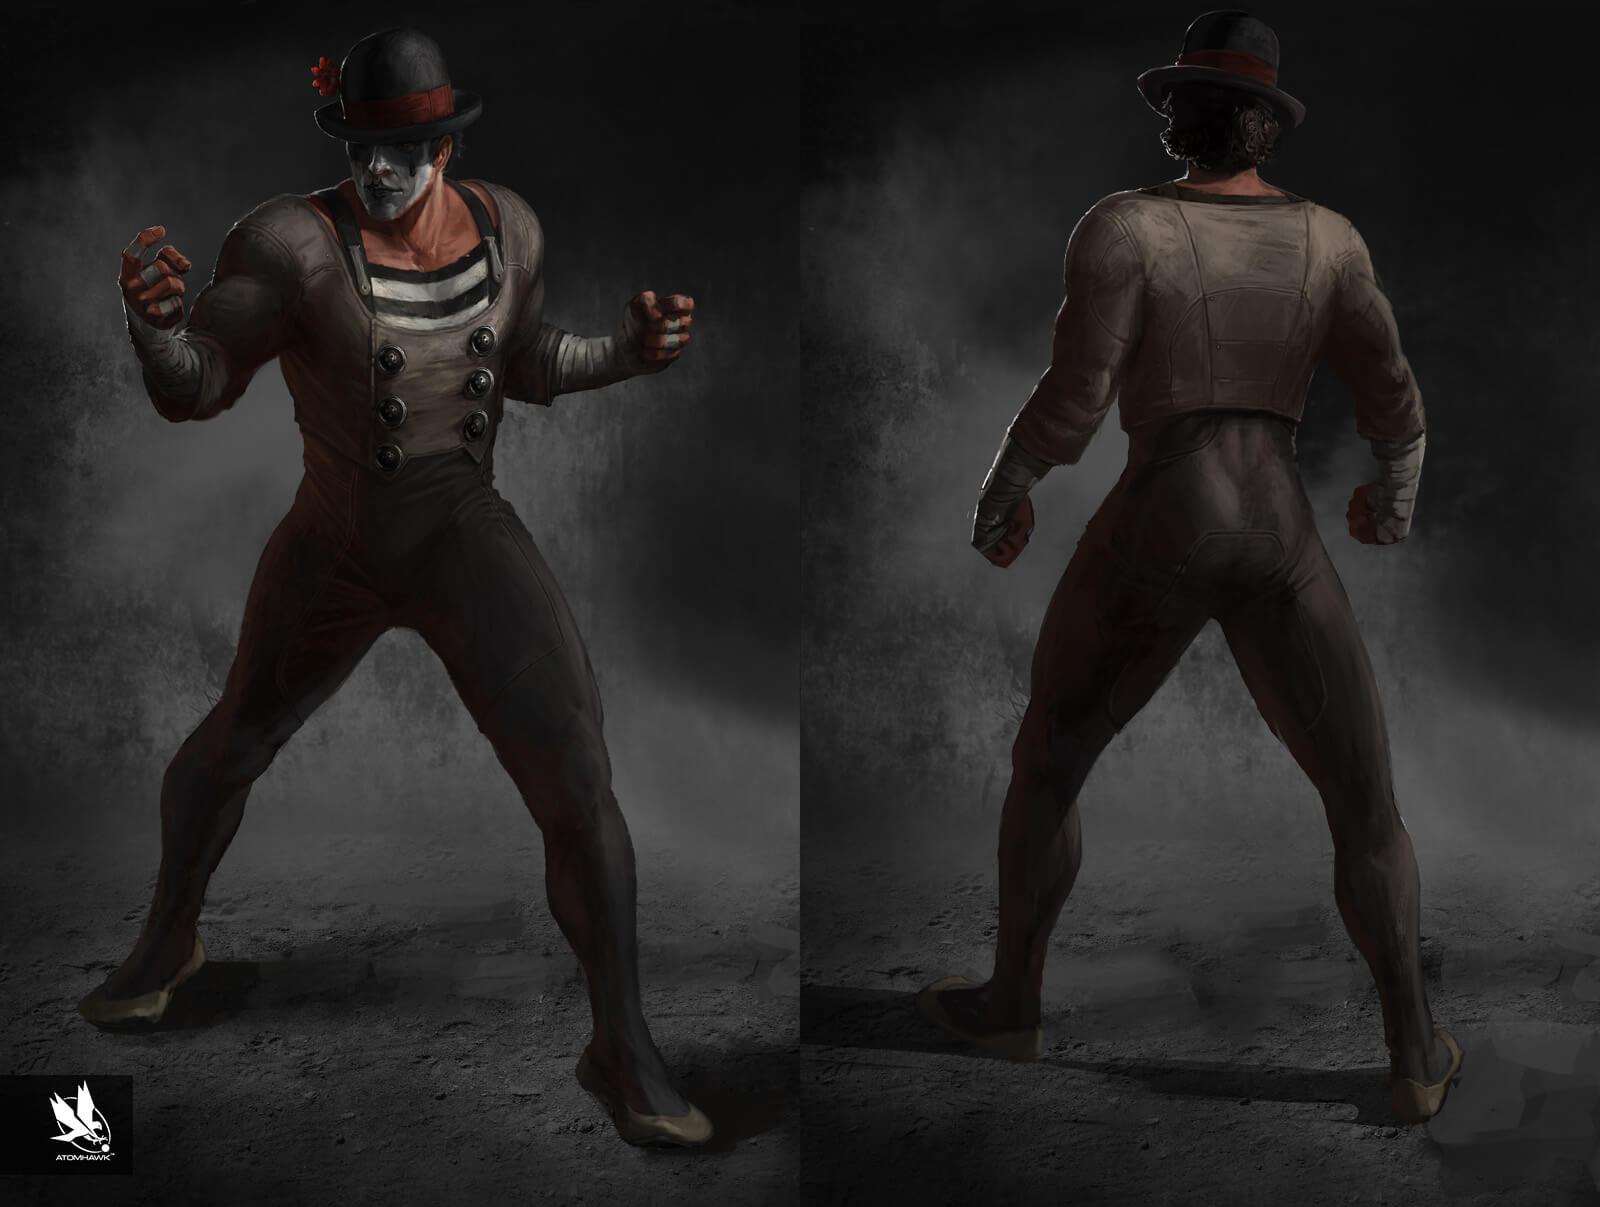 Mortal Kombat X - Character Design - Ninja Mime